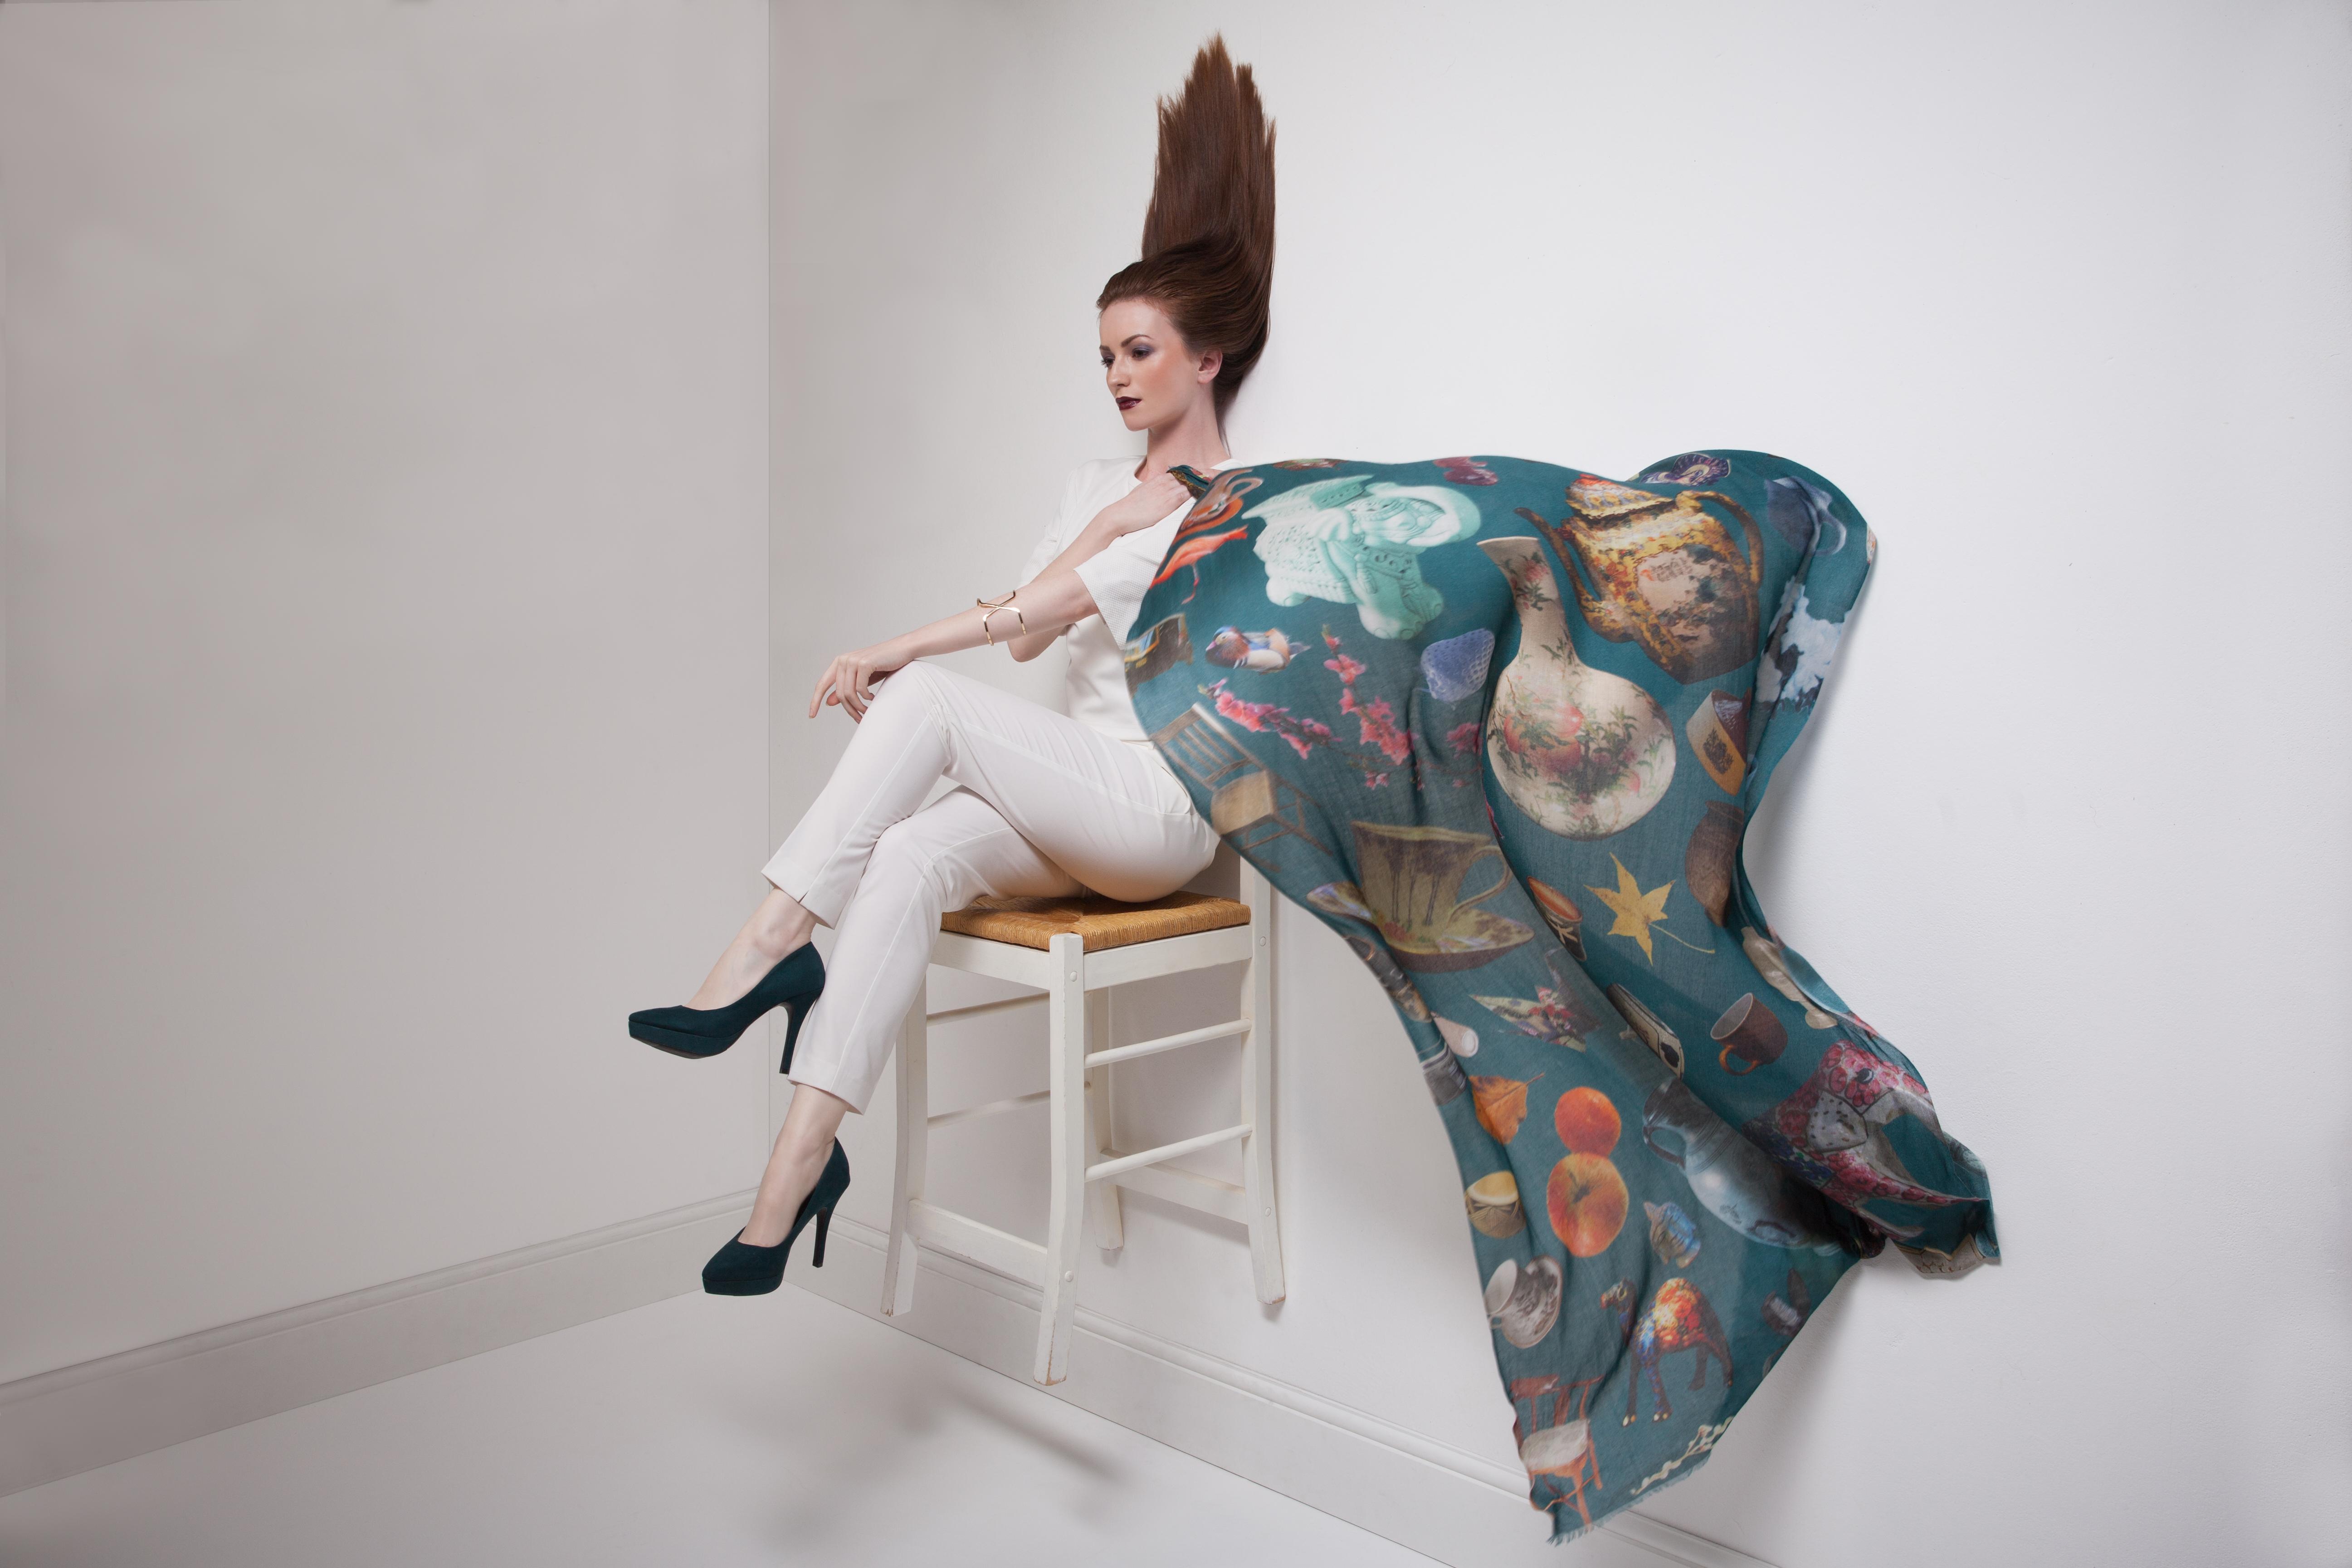 Jenny Collicott